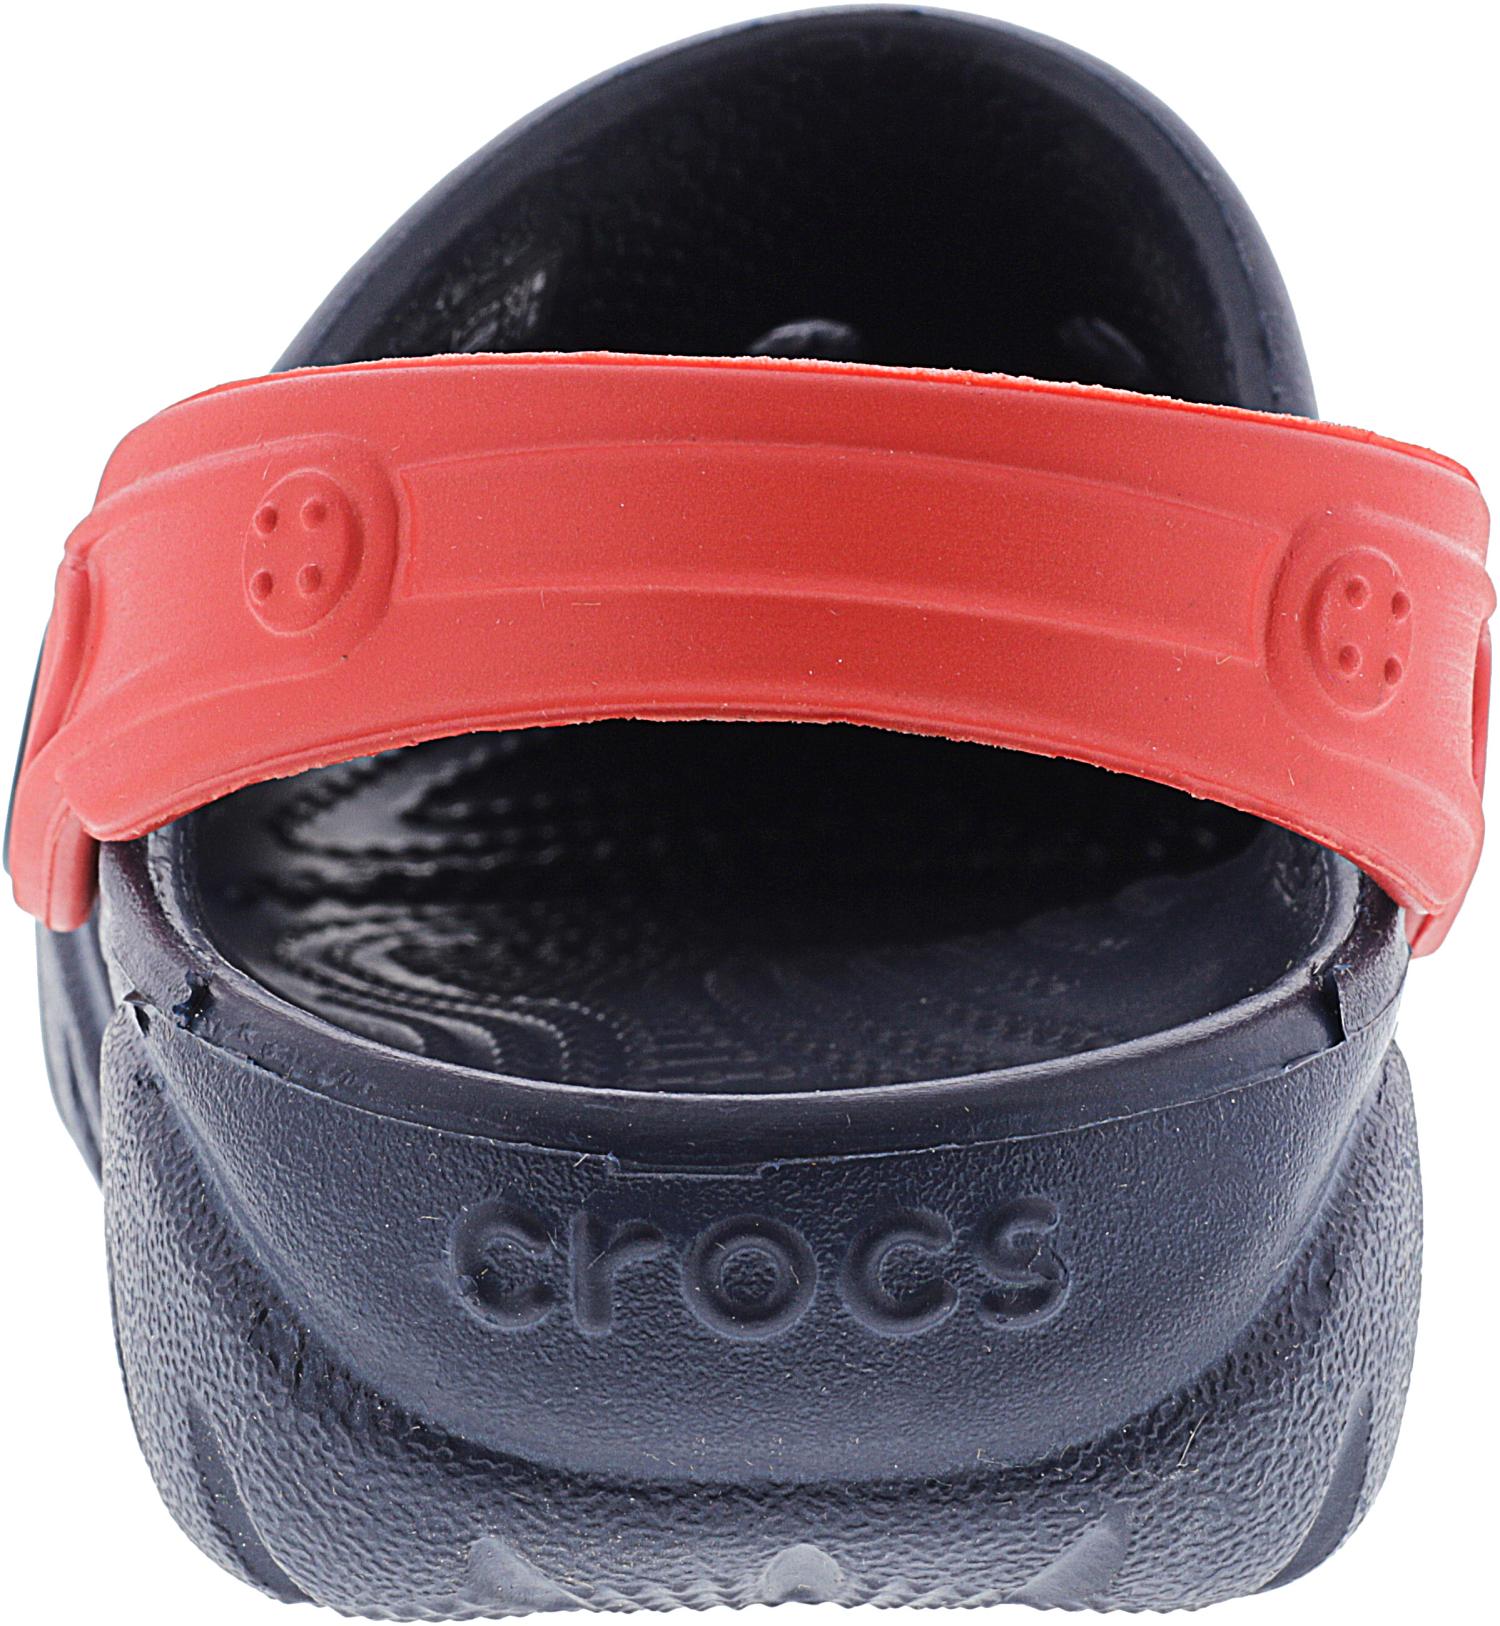 Crocs-Kids-Swiftwater-Clog-Ltd-Clogs thumbnail 21